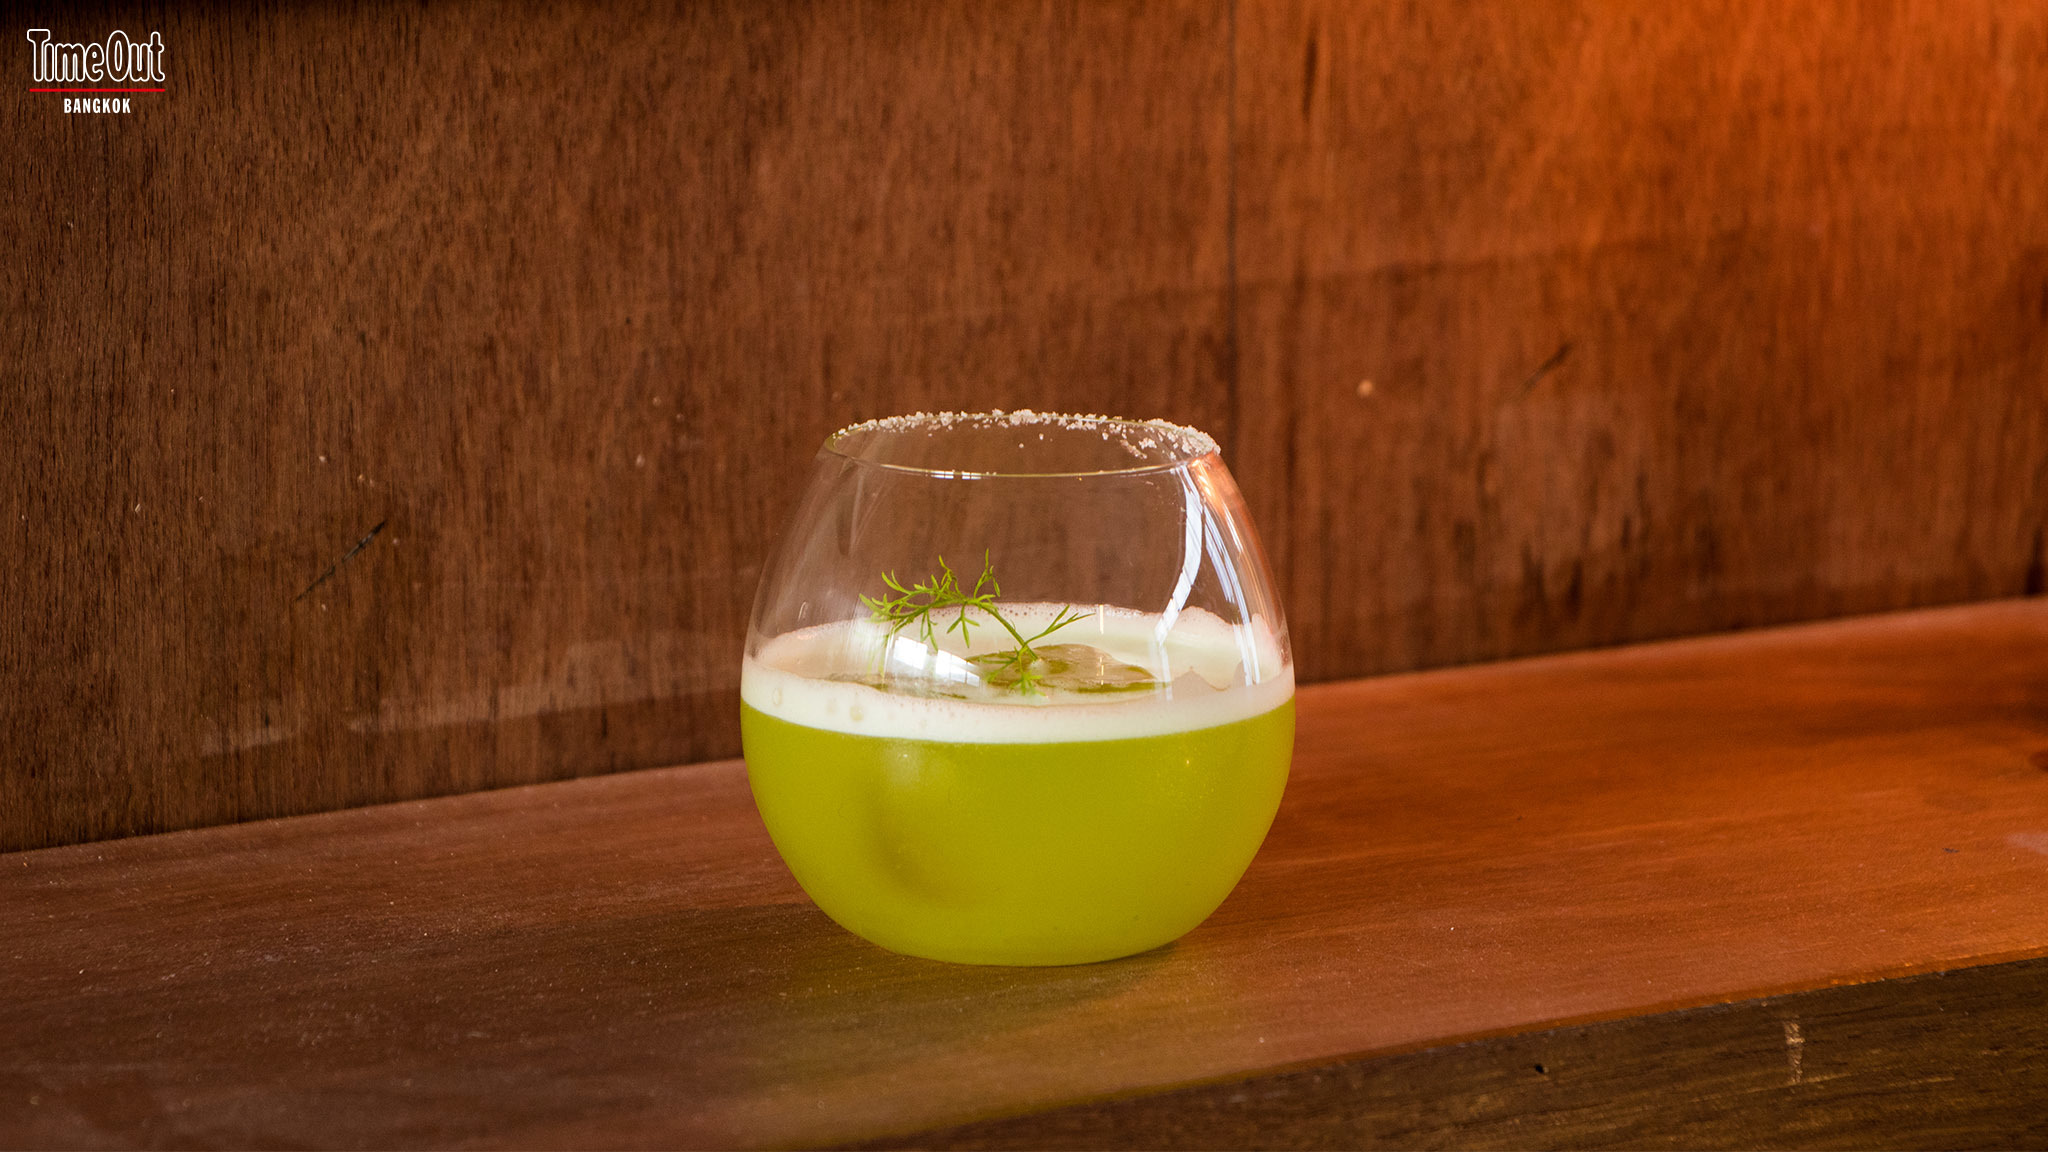 Kunchai/Melon, cocktail at Ku Bar